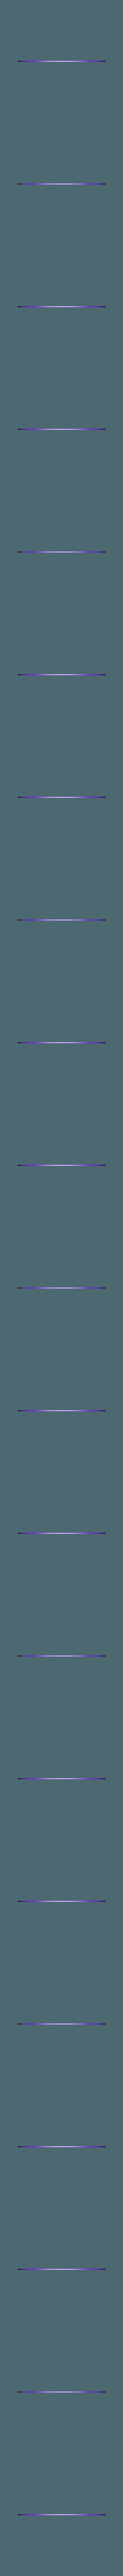 magic_white.STL Download free STL file Minimal Multi-color NBA coasters • 3D print object, MosaicManufacturing